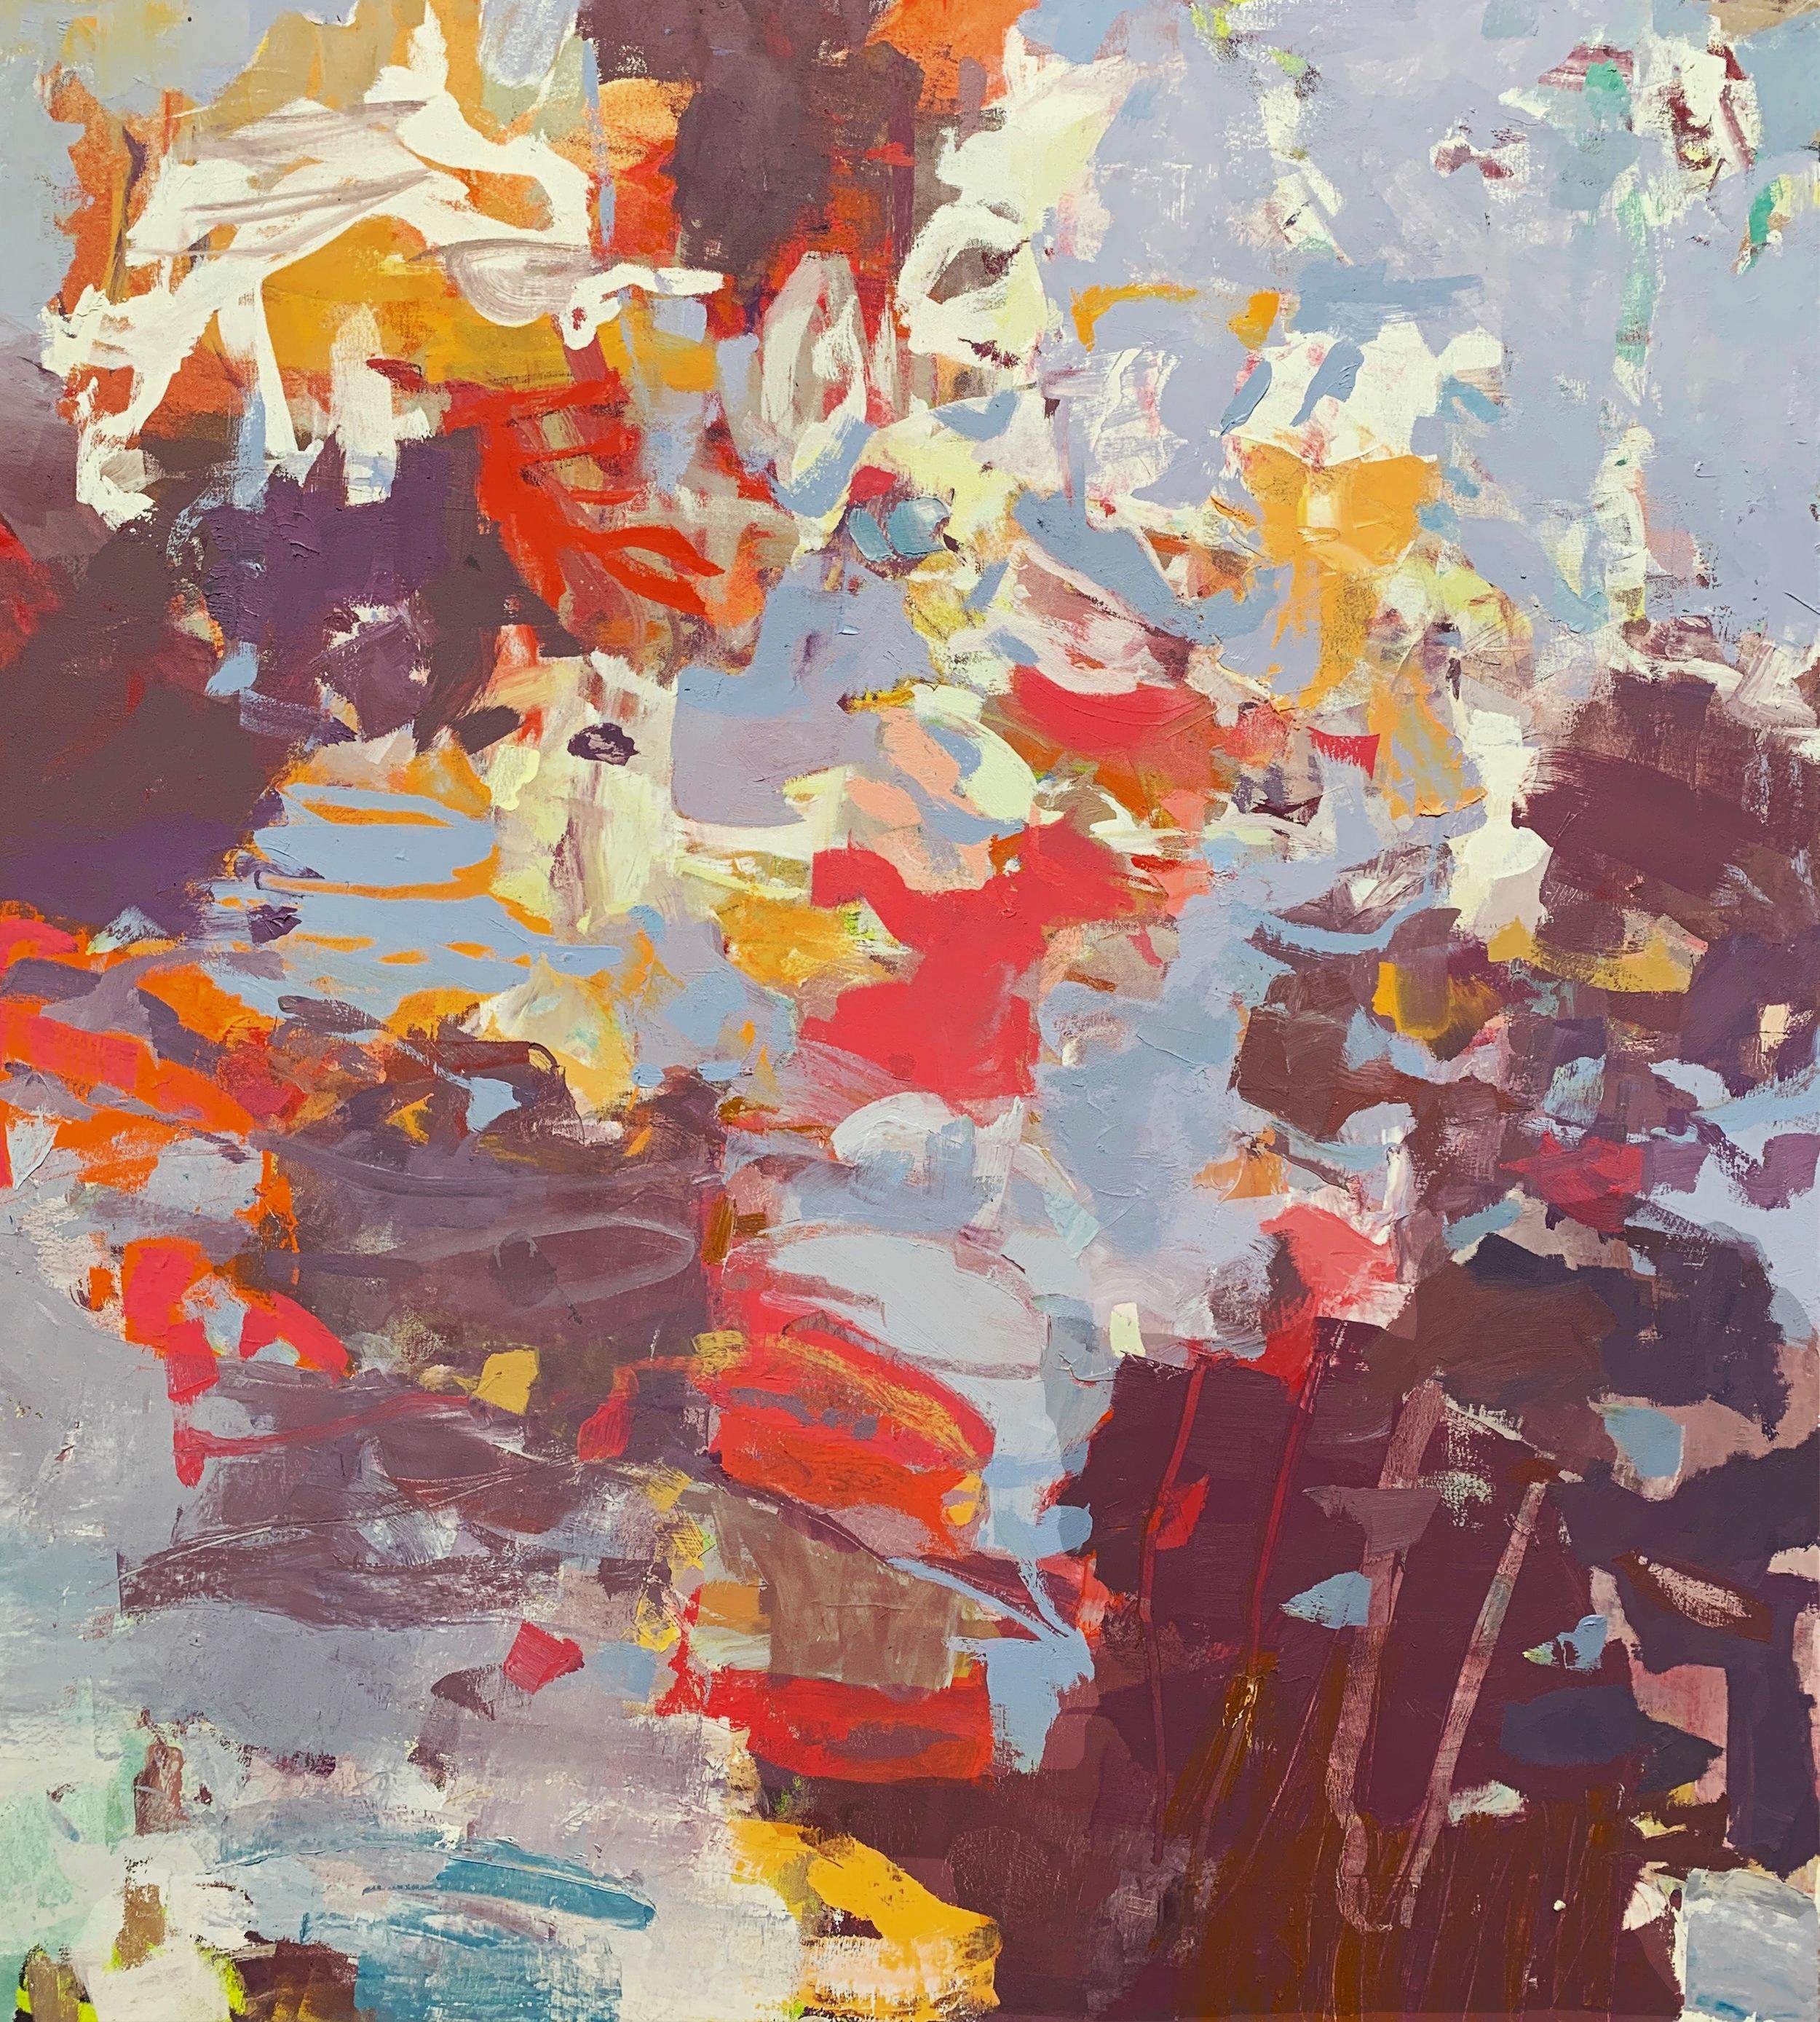 Sunriver  2019 42 x 38 inches Oil on Canvas